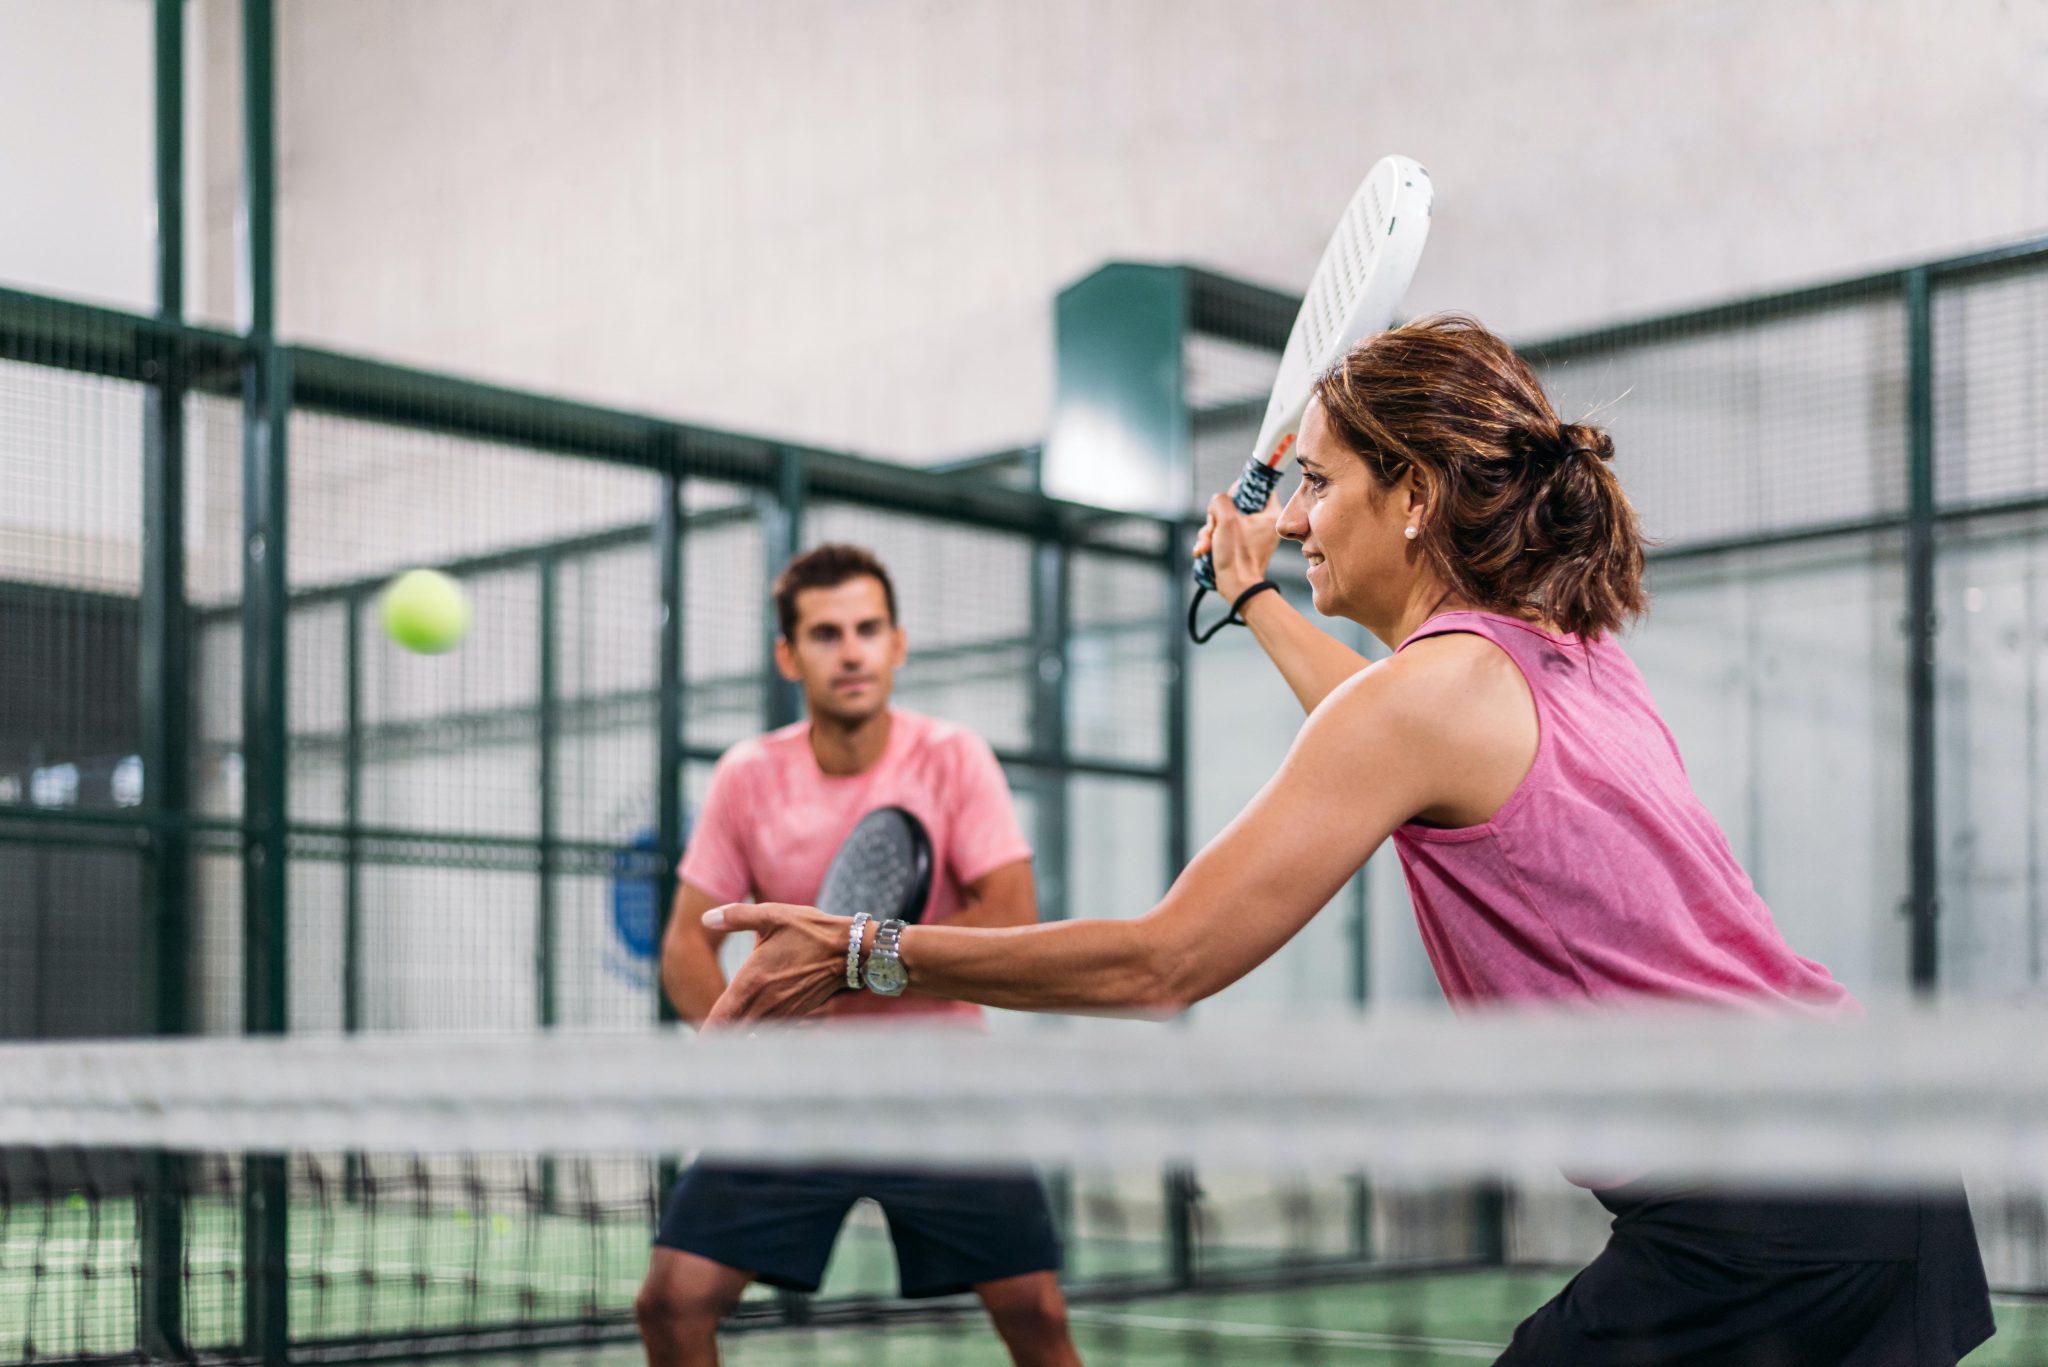 Fitness- en lifestyletrends: padel